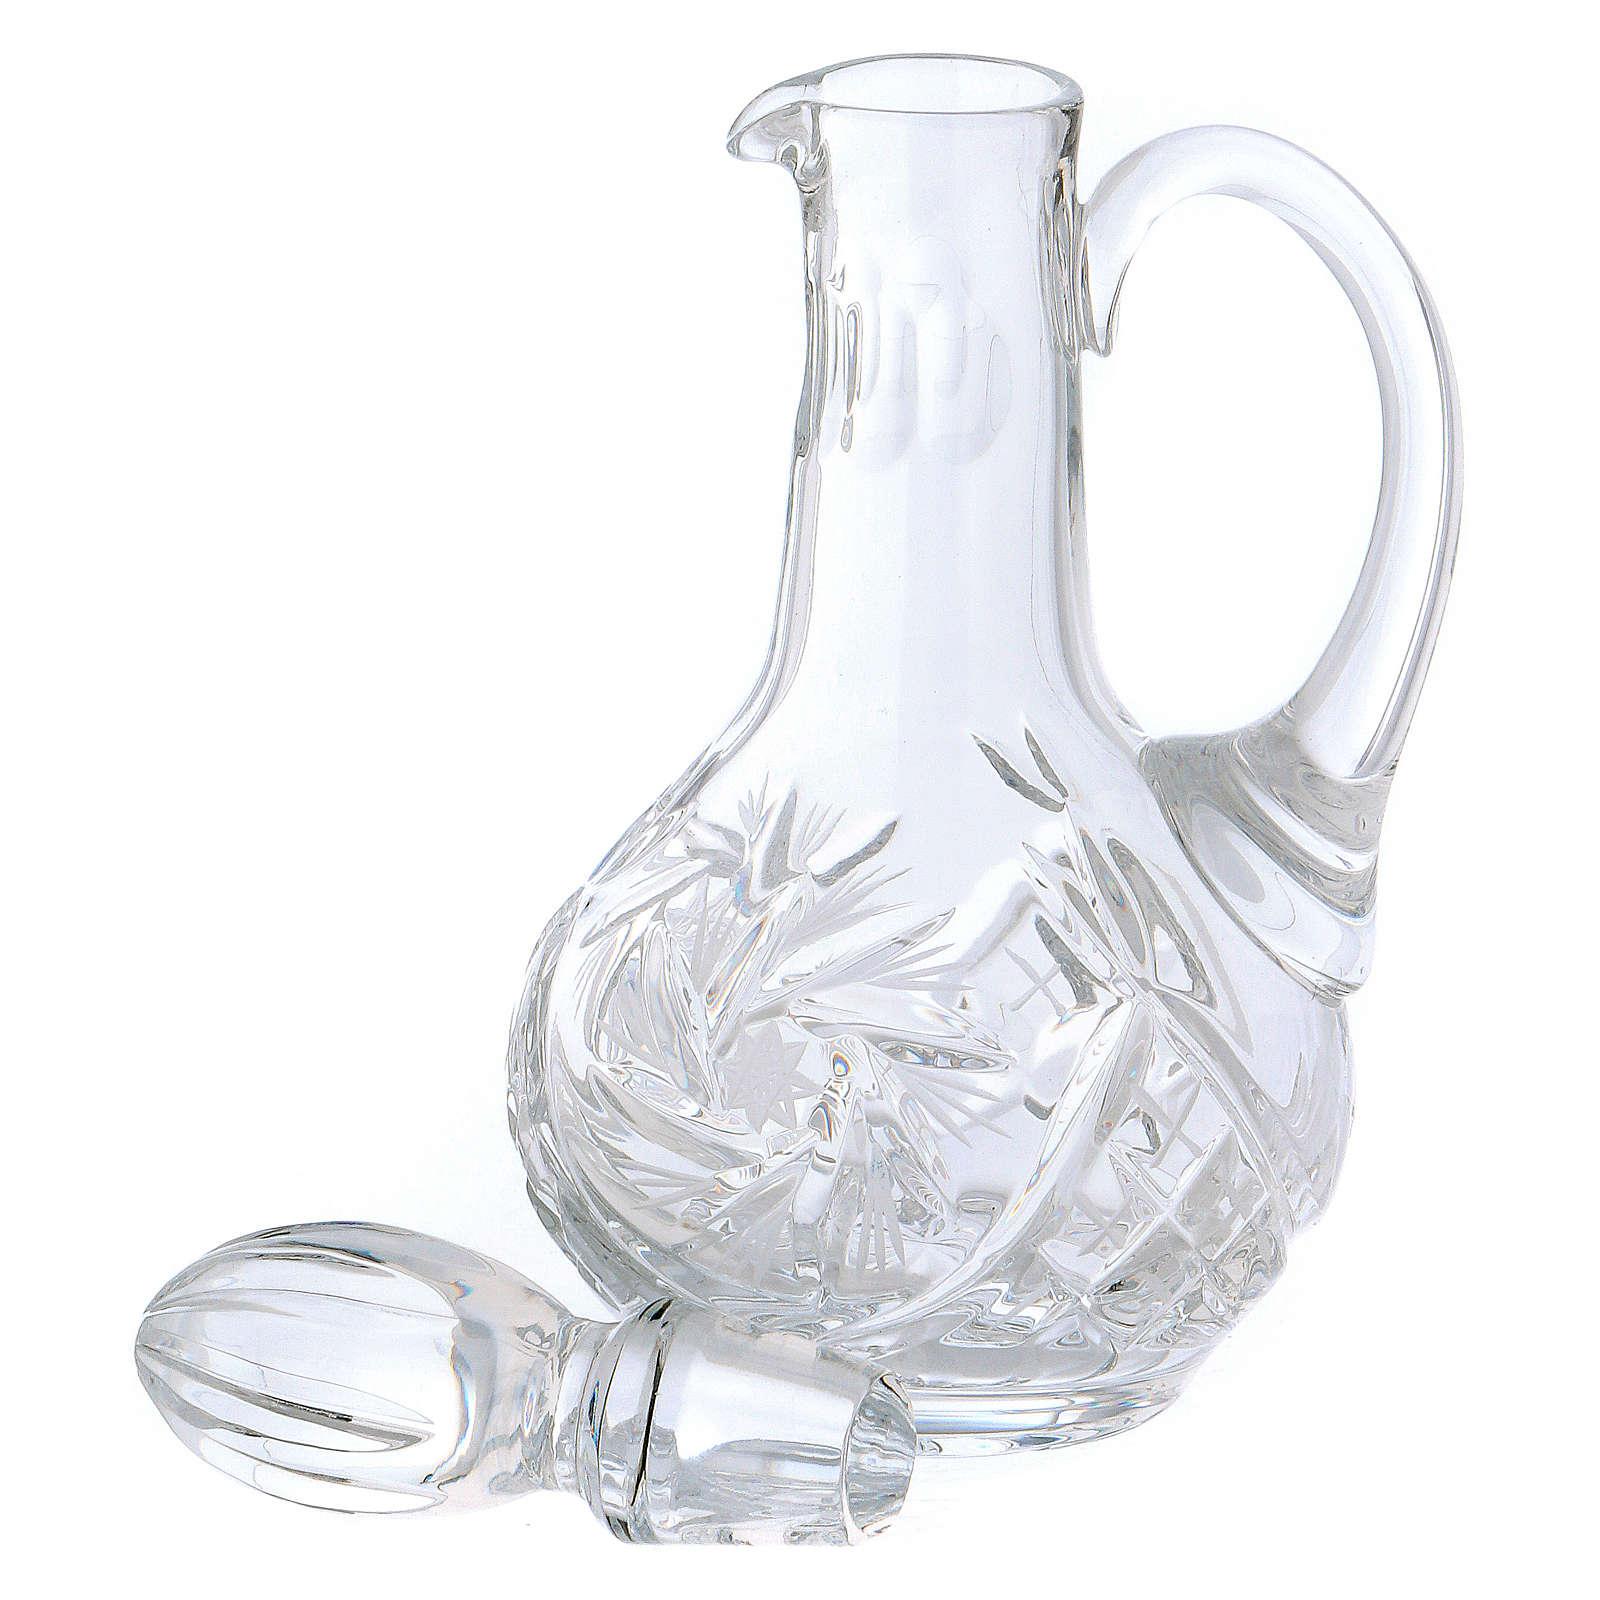 Set vinajeras cristal misa 160 ml. 4